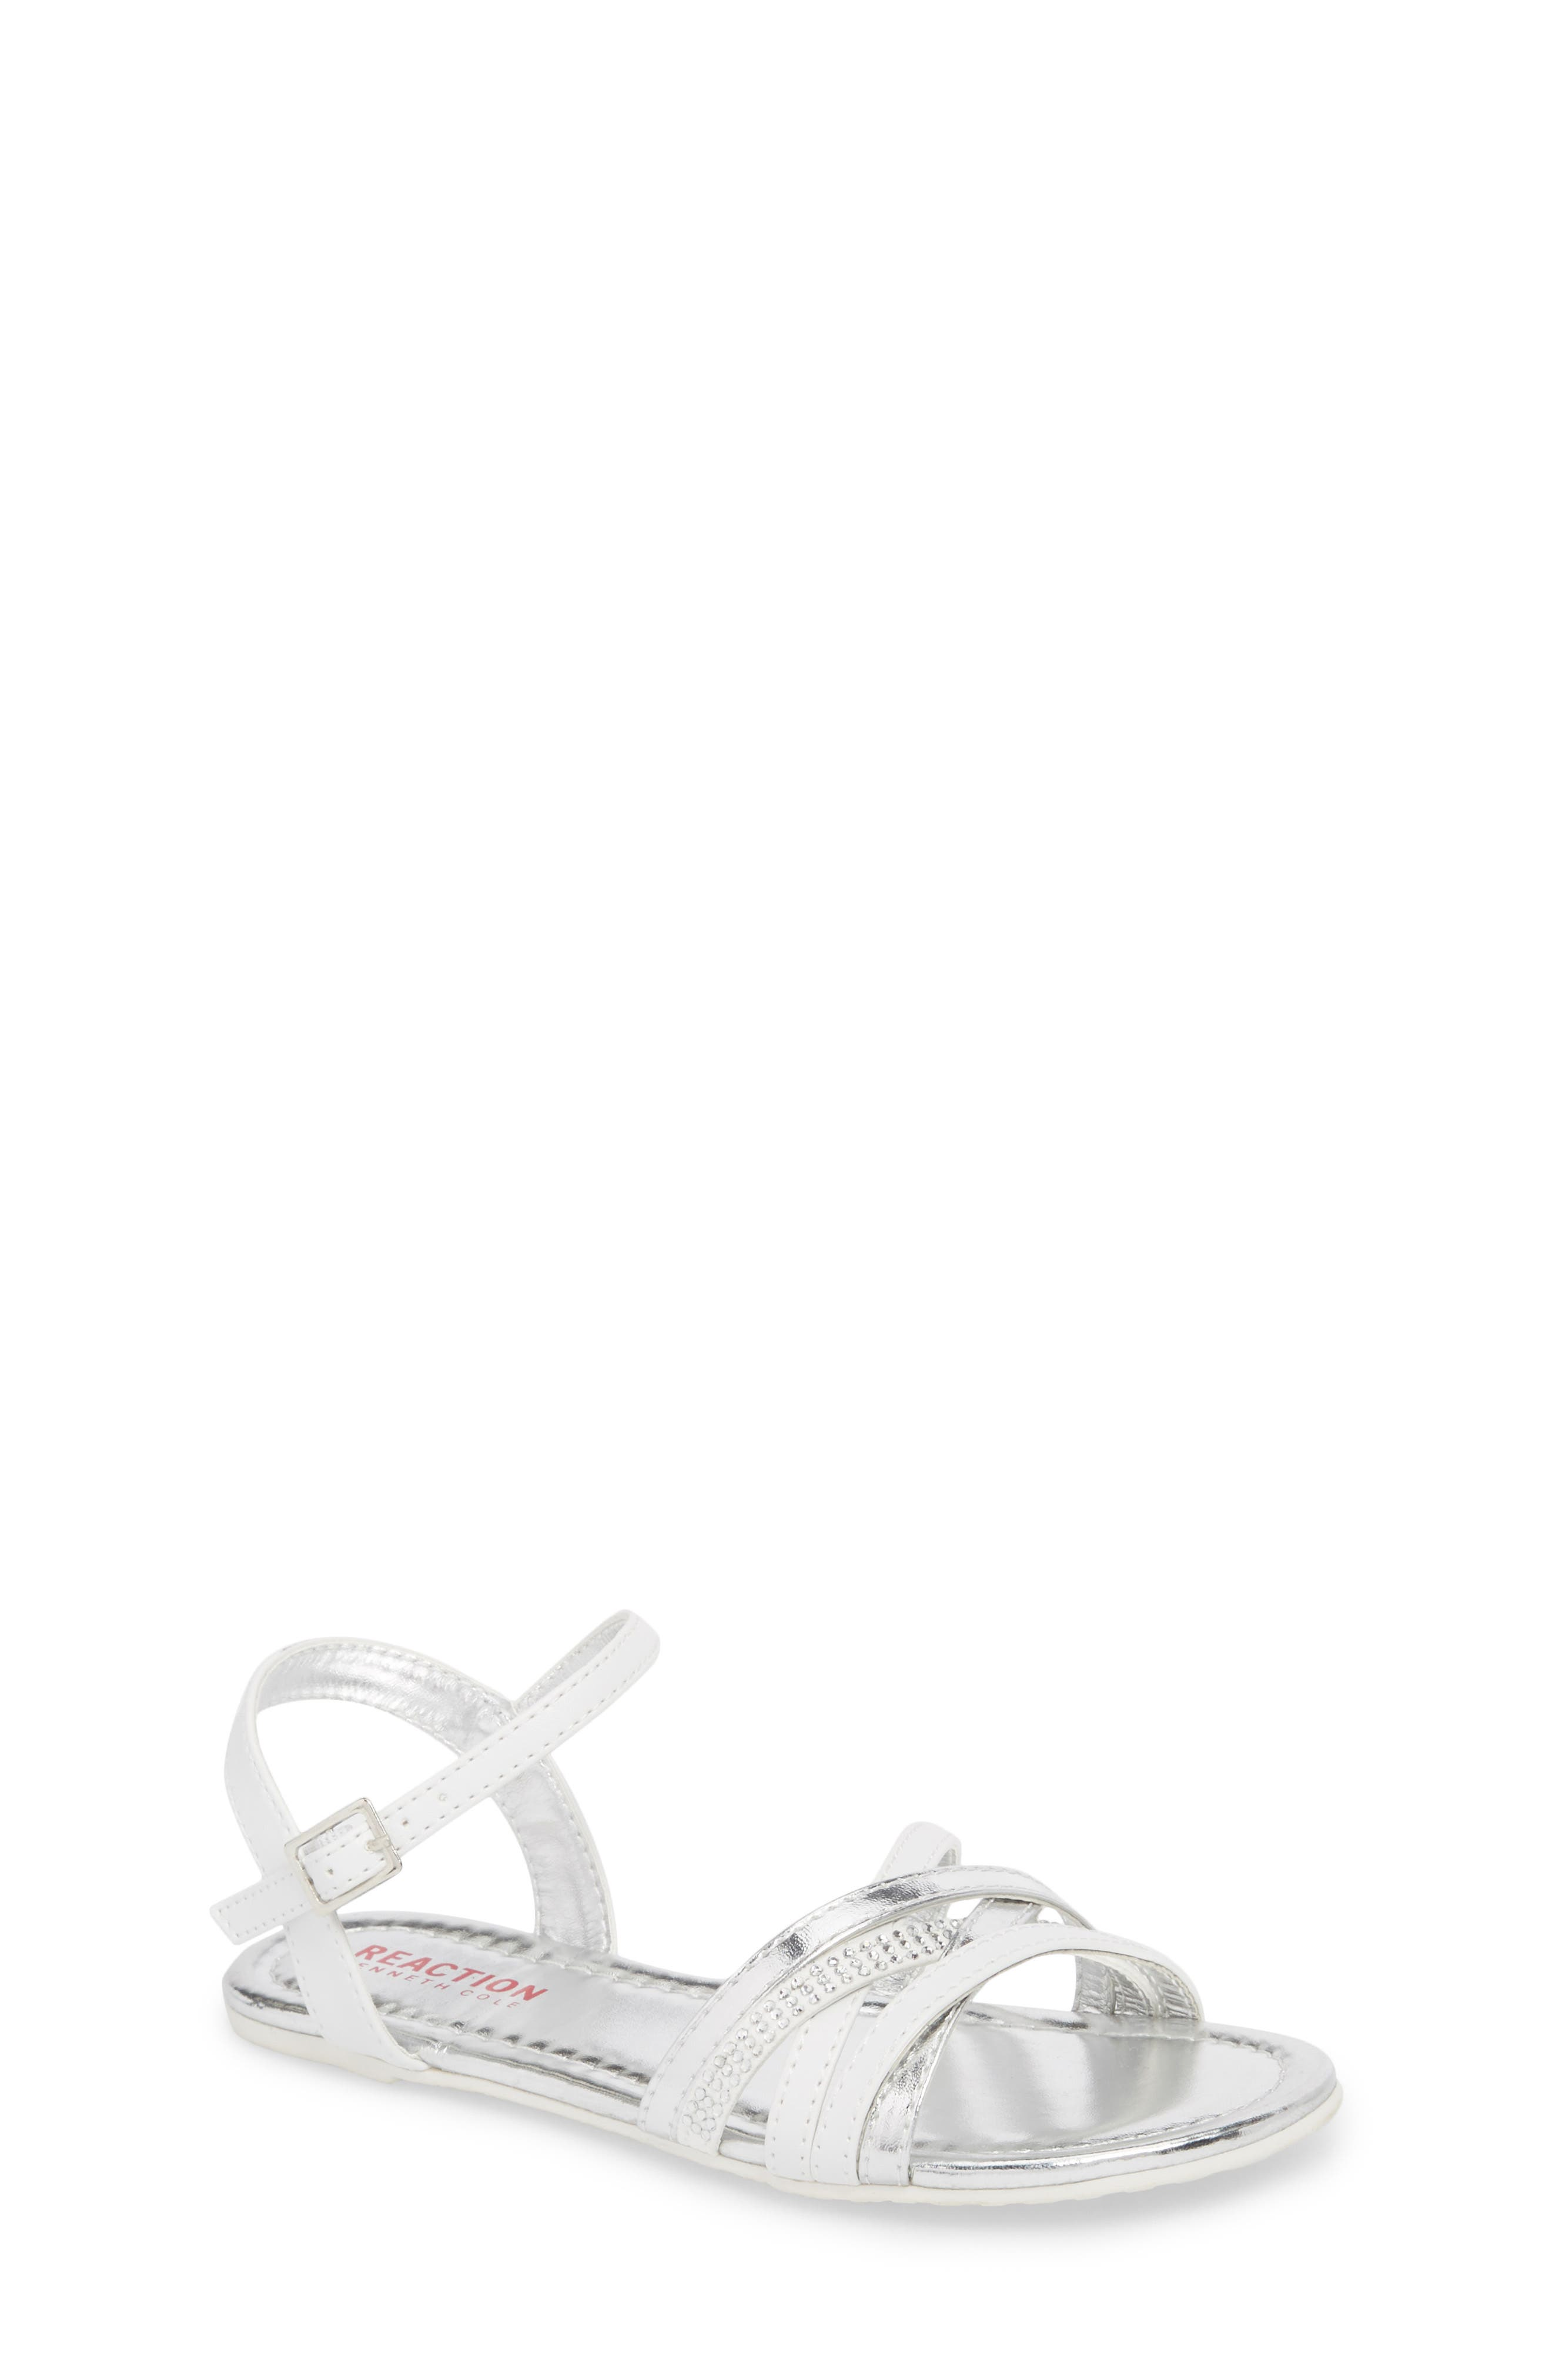 Kiera Getty Crystal Sandal,                         Main,                         color, 100